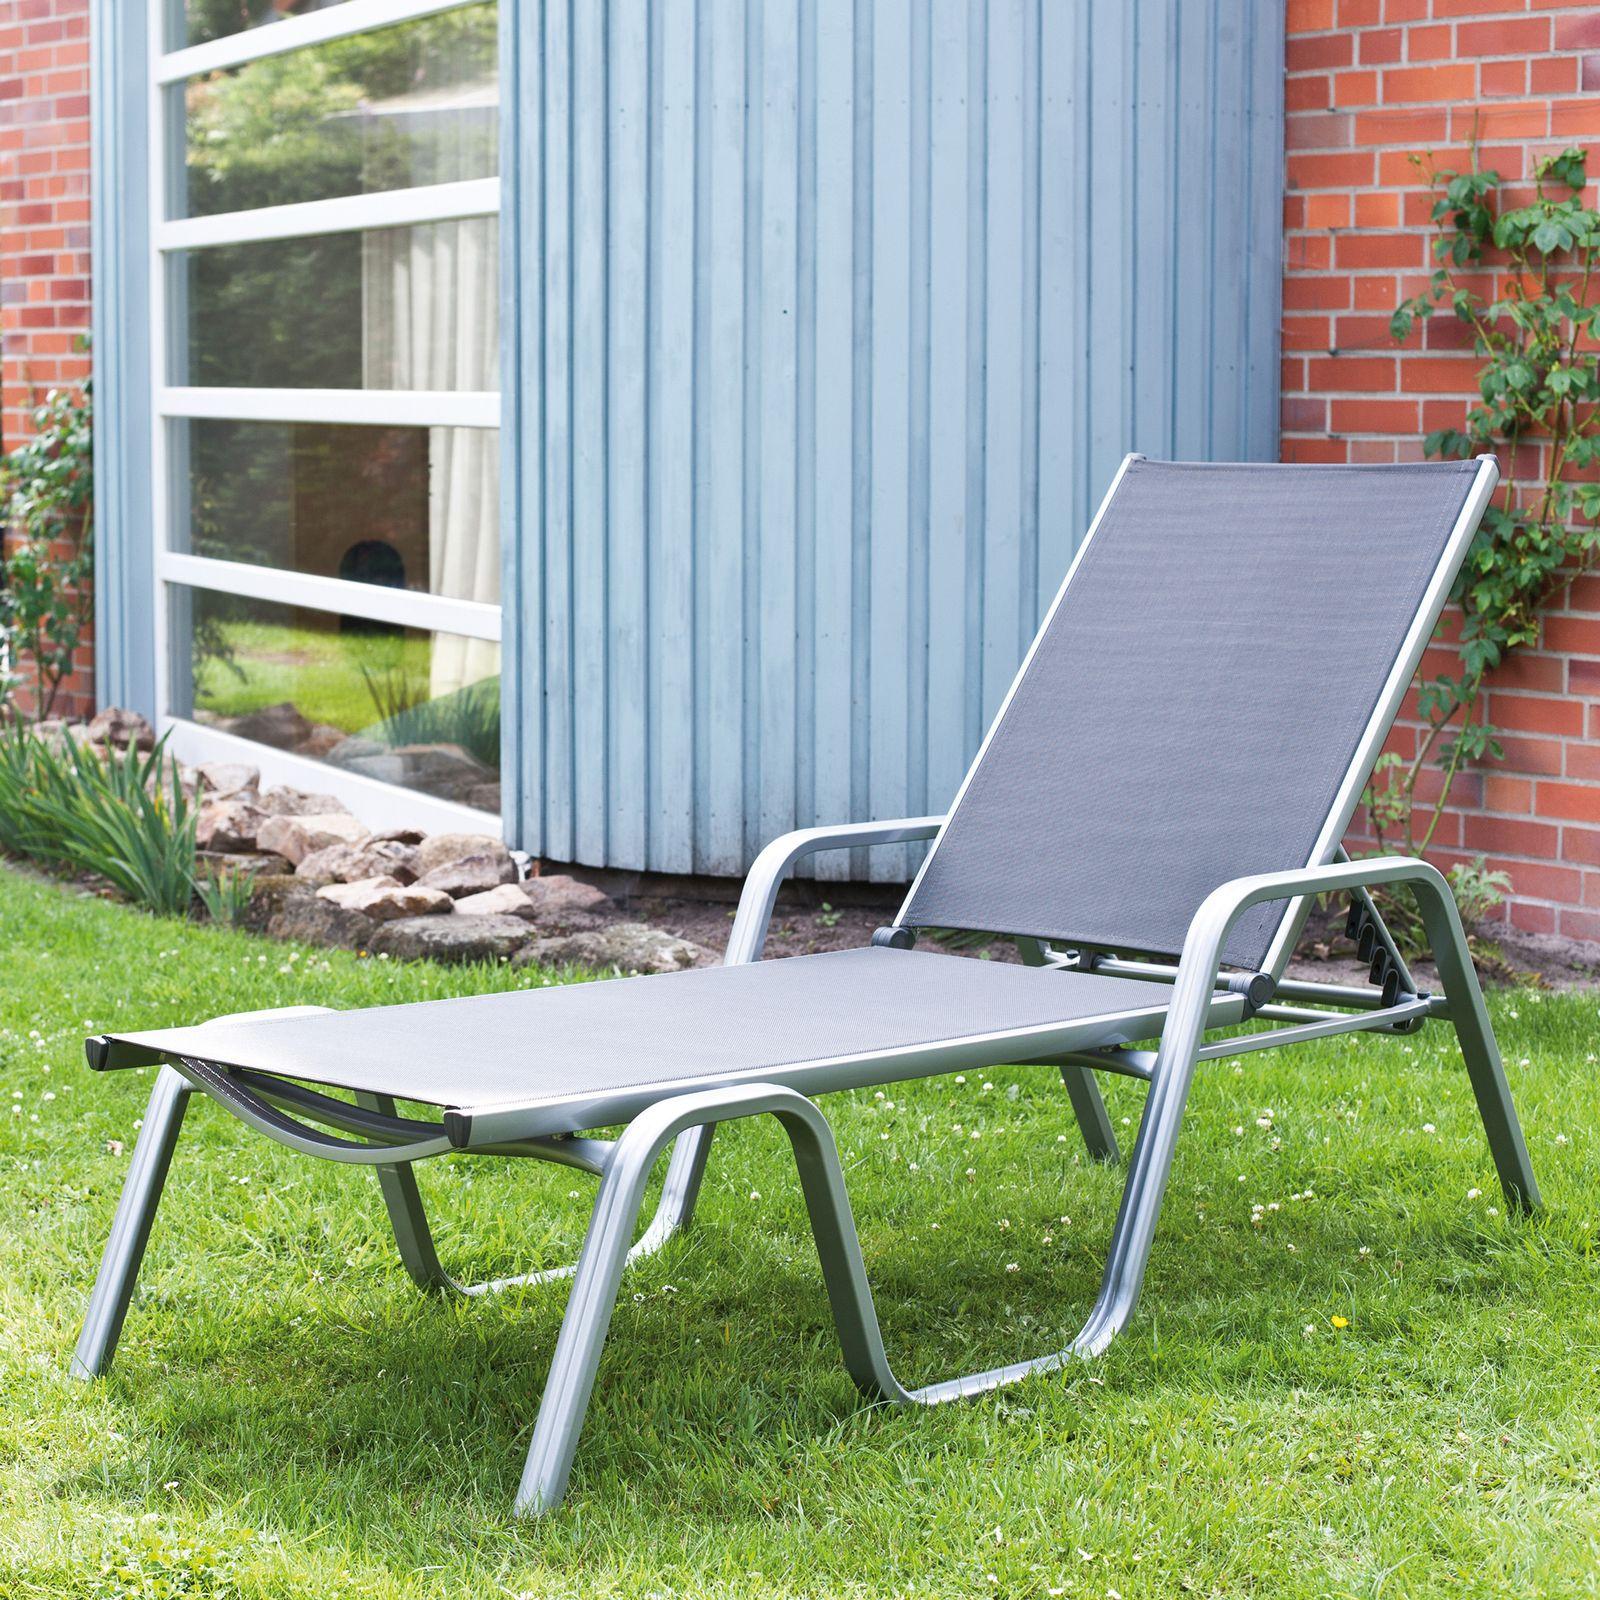 Łóżko ogrodowe Basic Plus srebrny KETTLER